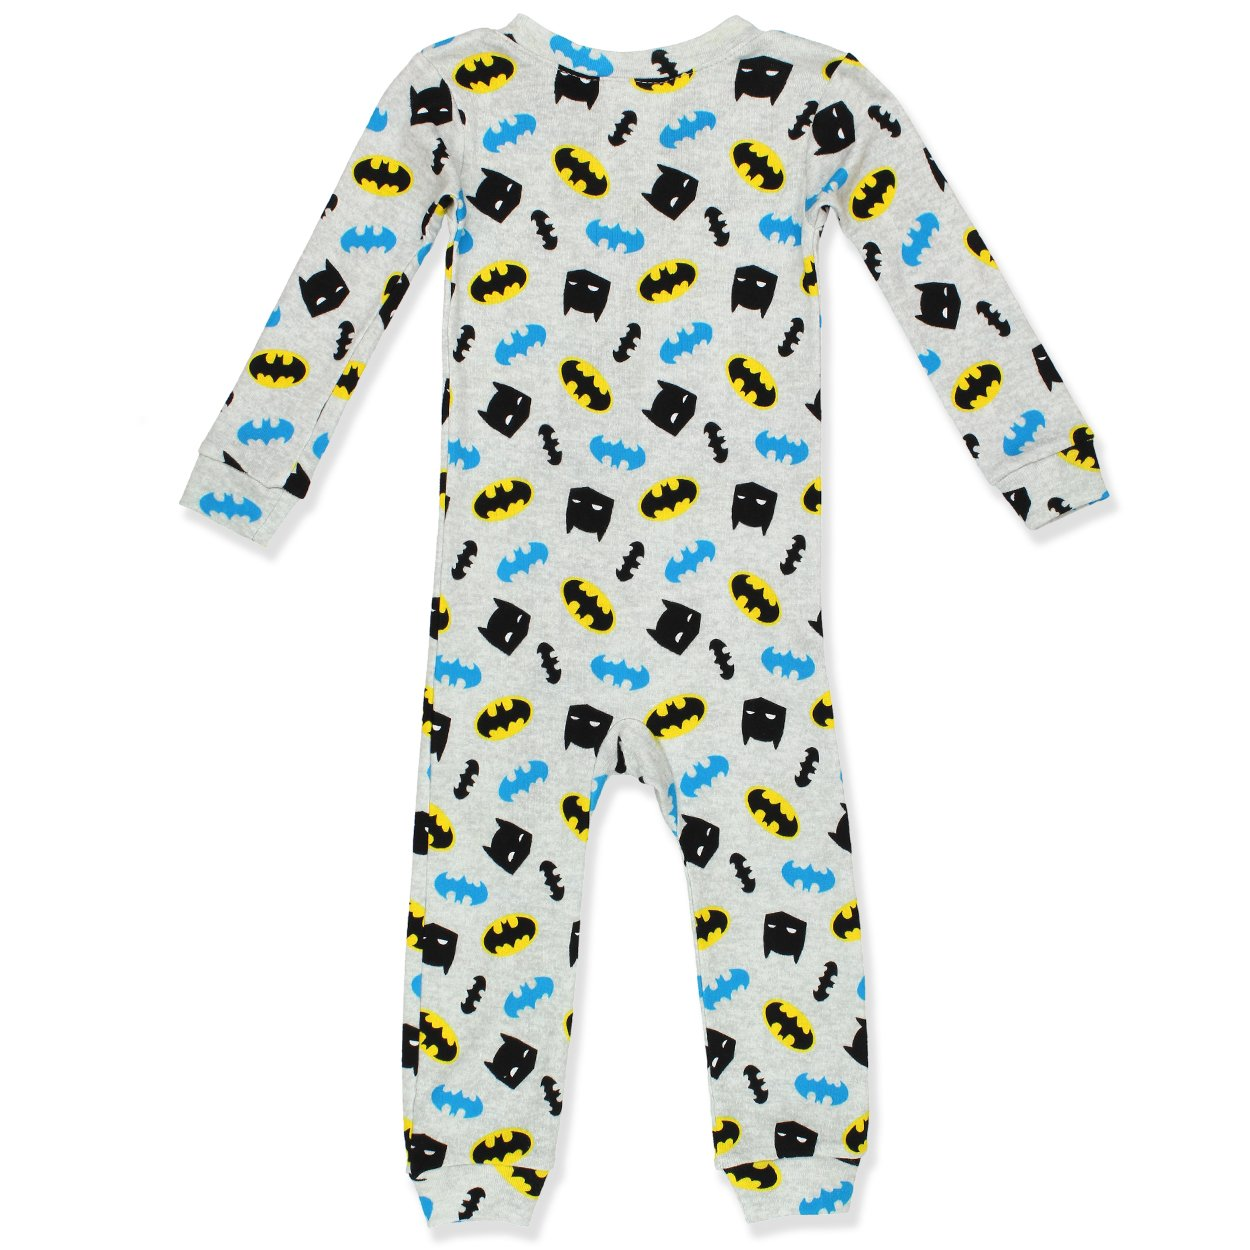 Batman Boys Toddler Cotton Onesie 21BM238EBSZA-P6